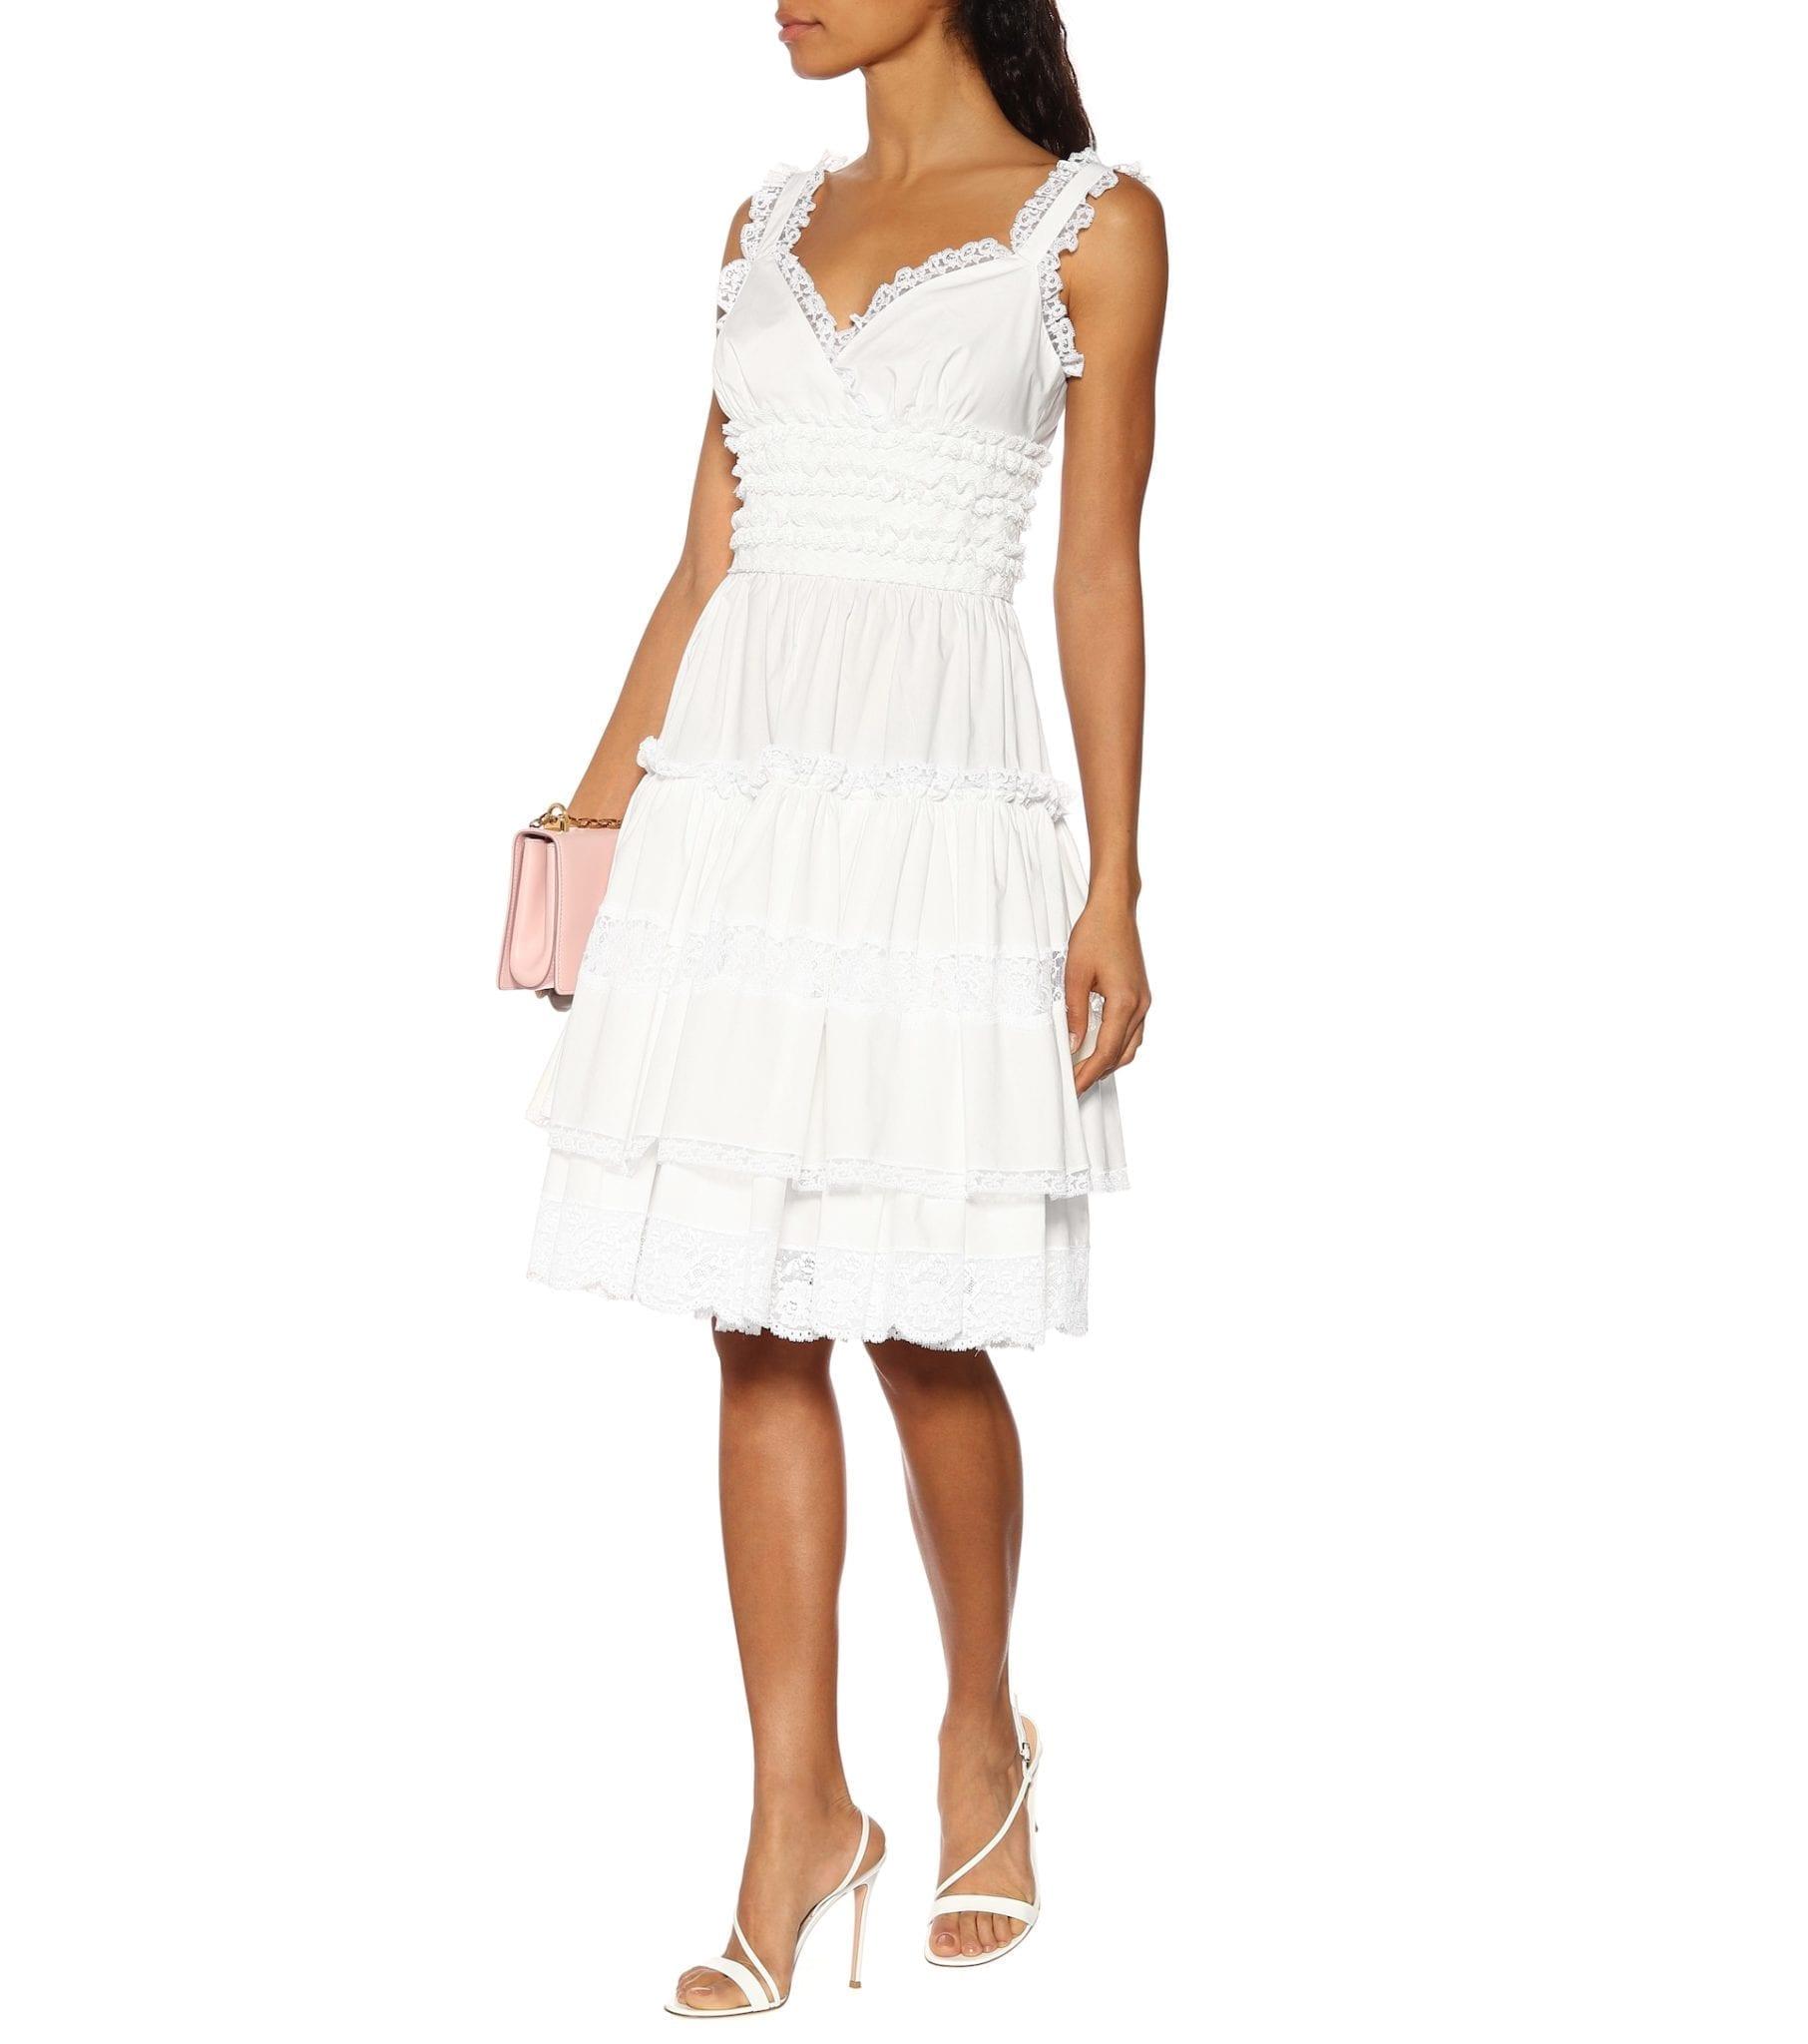 DOLCE & GABBANA Lace-Trimmed Cotton Mini White Dress